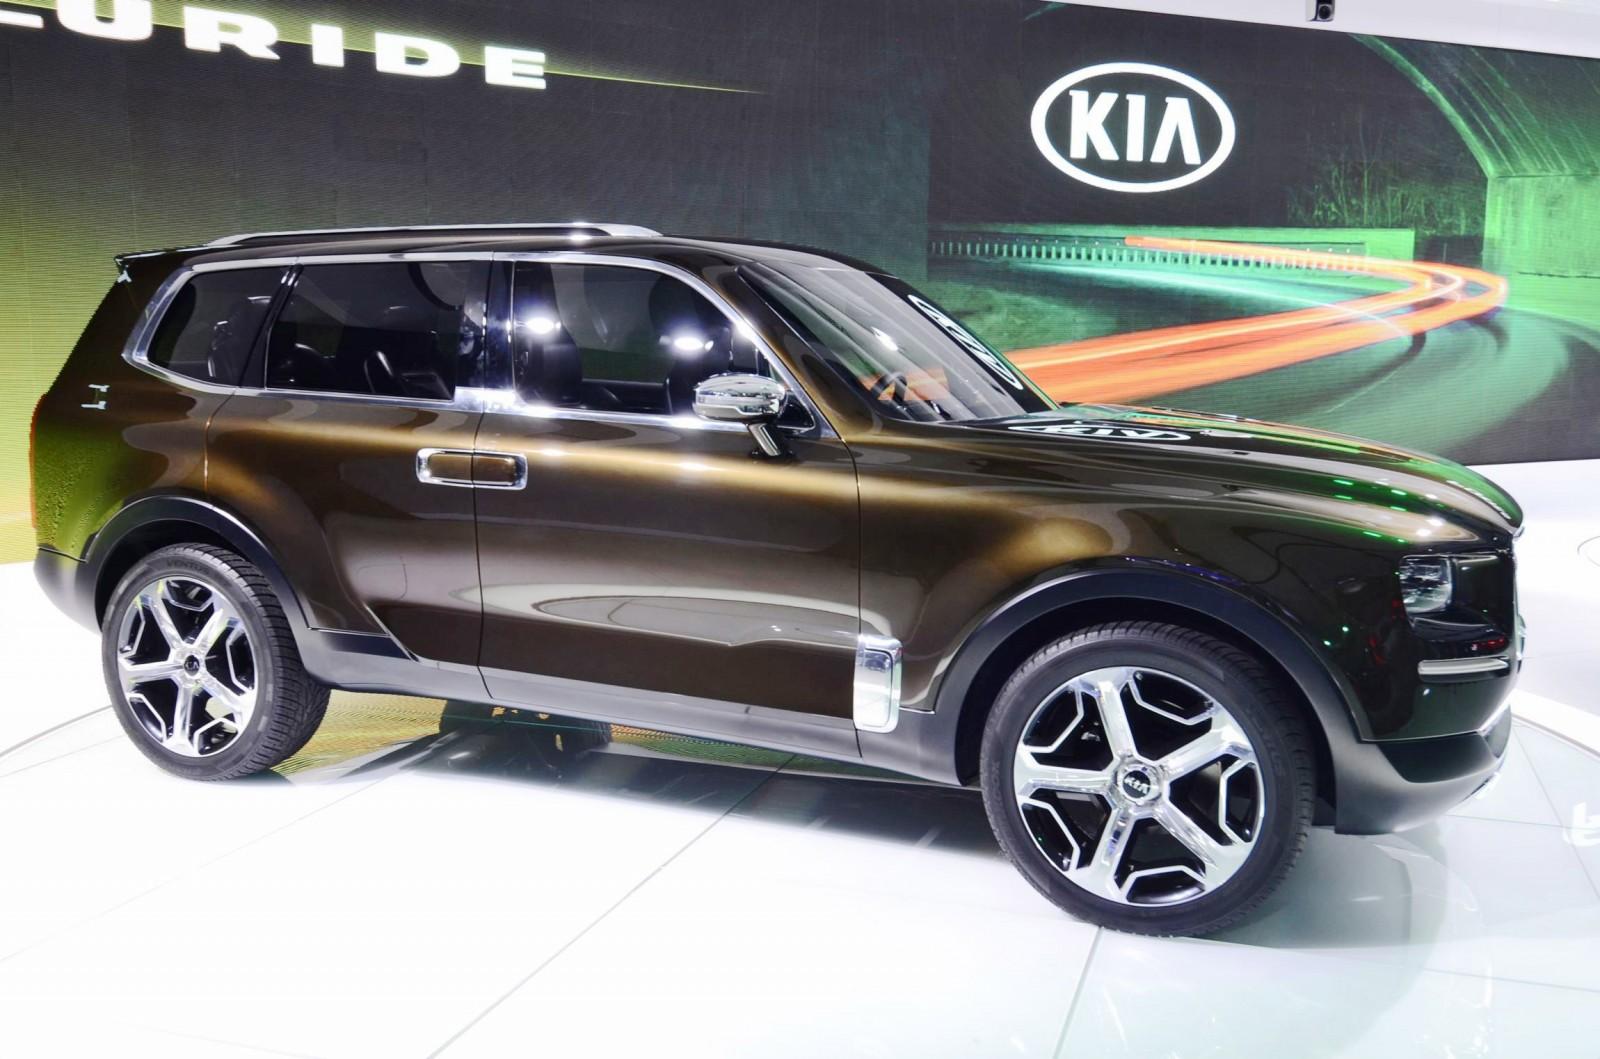 Luxury Suv 3 Rows >> 2016 Kia TELLURIDE Concept - LWB SUV Brings 7-Seat Chalet Cachet